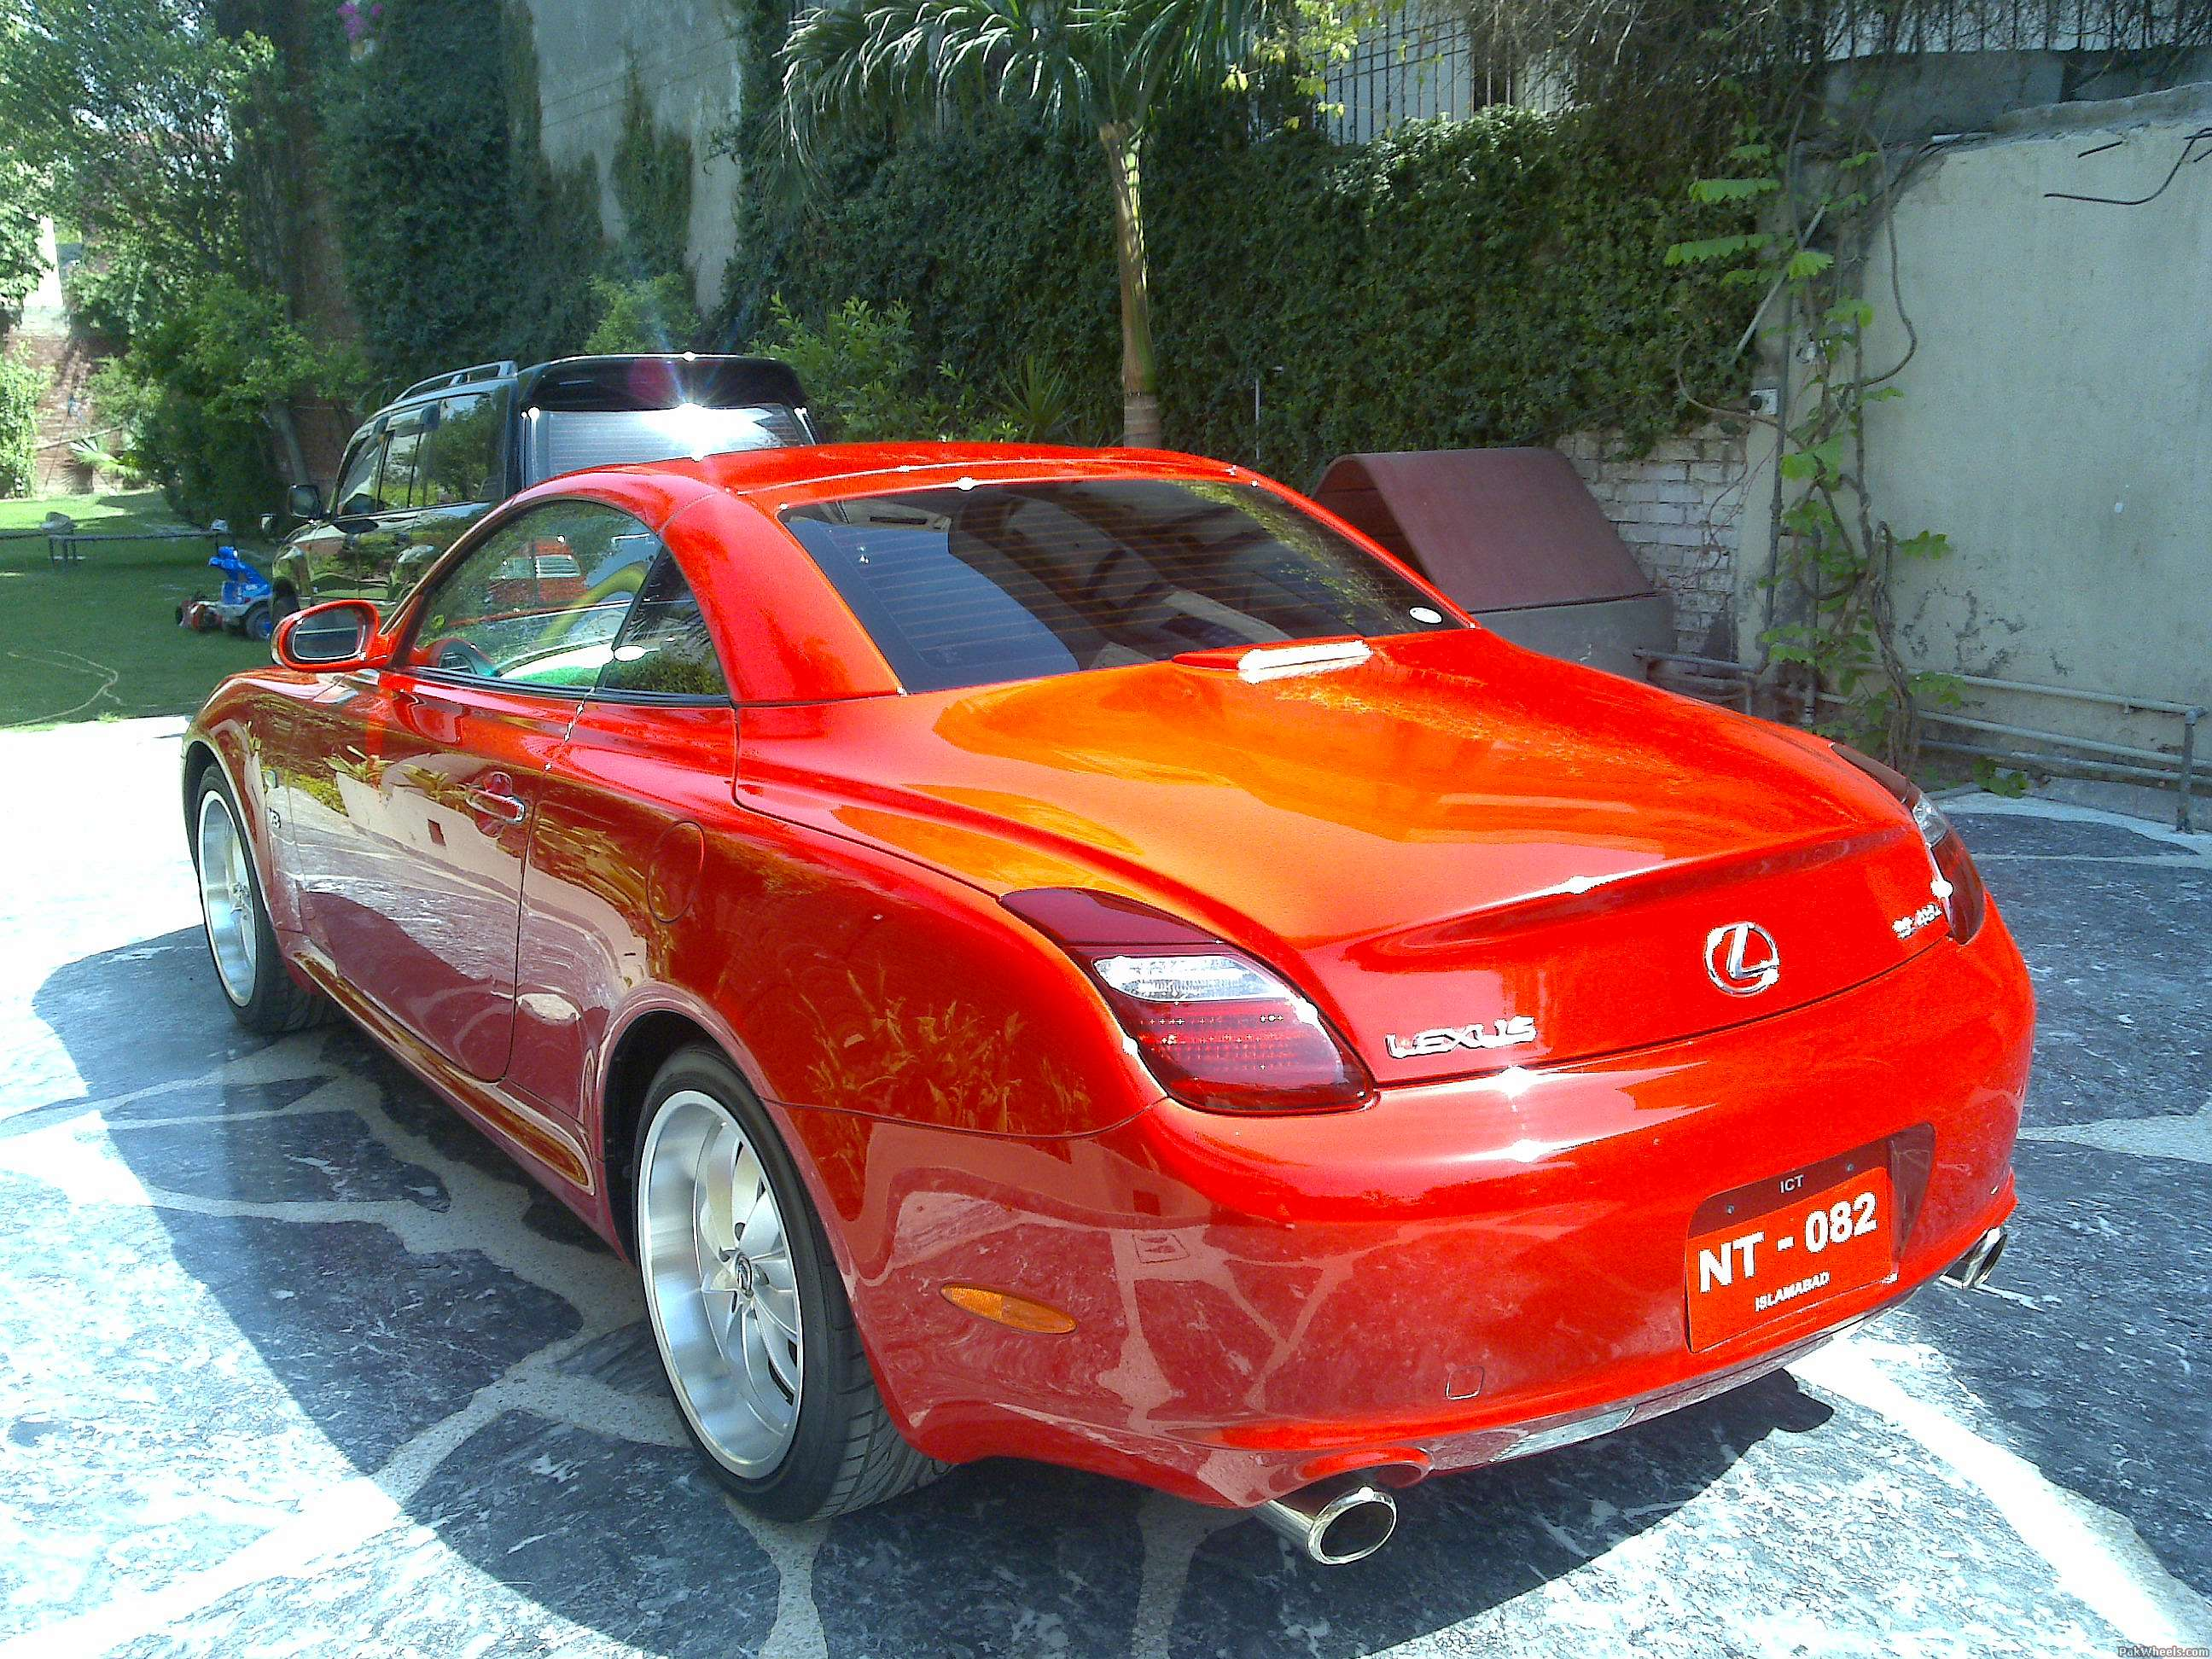 Lexus Sc Series - 2008 omzii Image-1